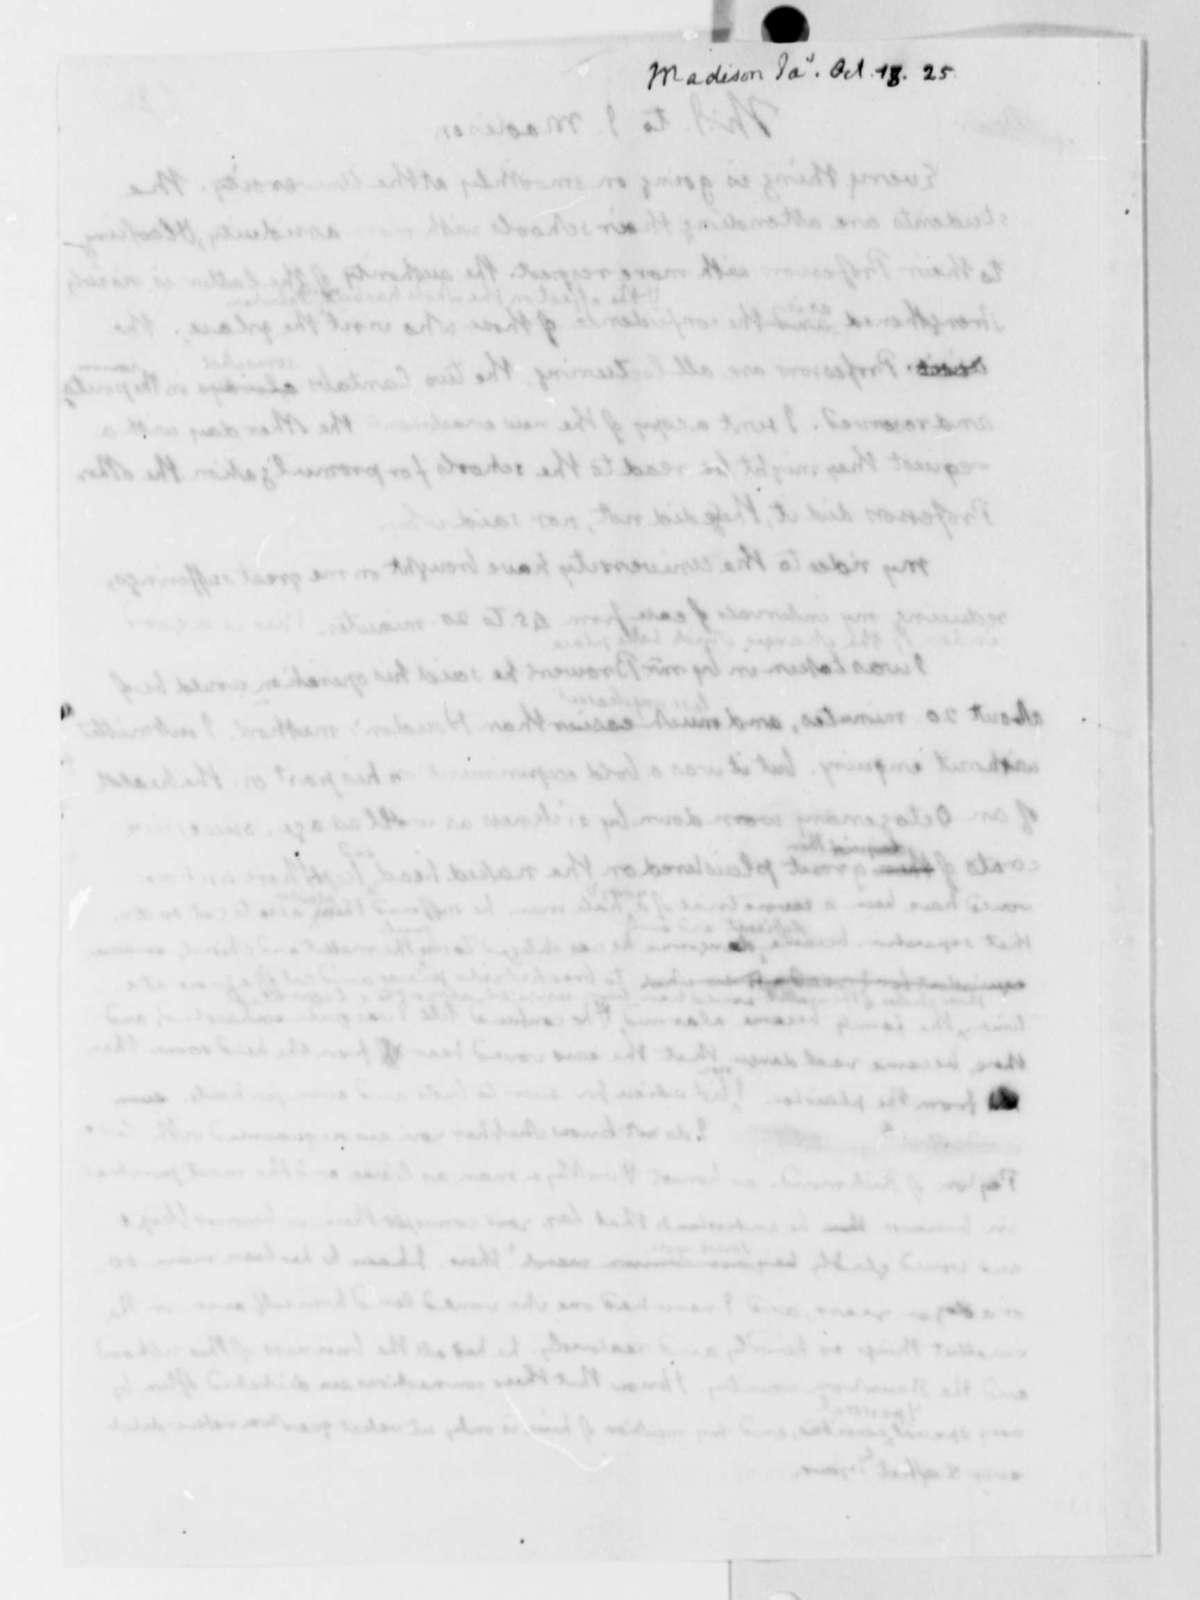 Thomas Jefferson to James Madison, October 18, 1825